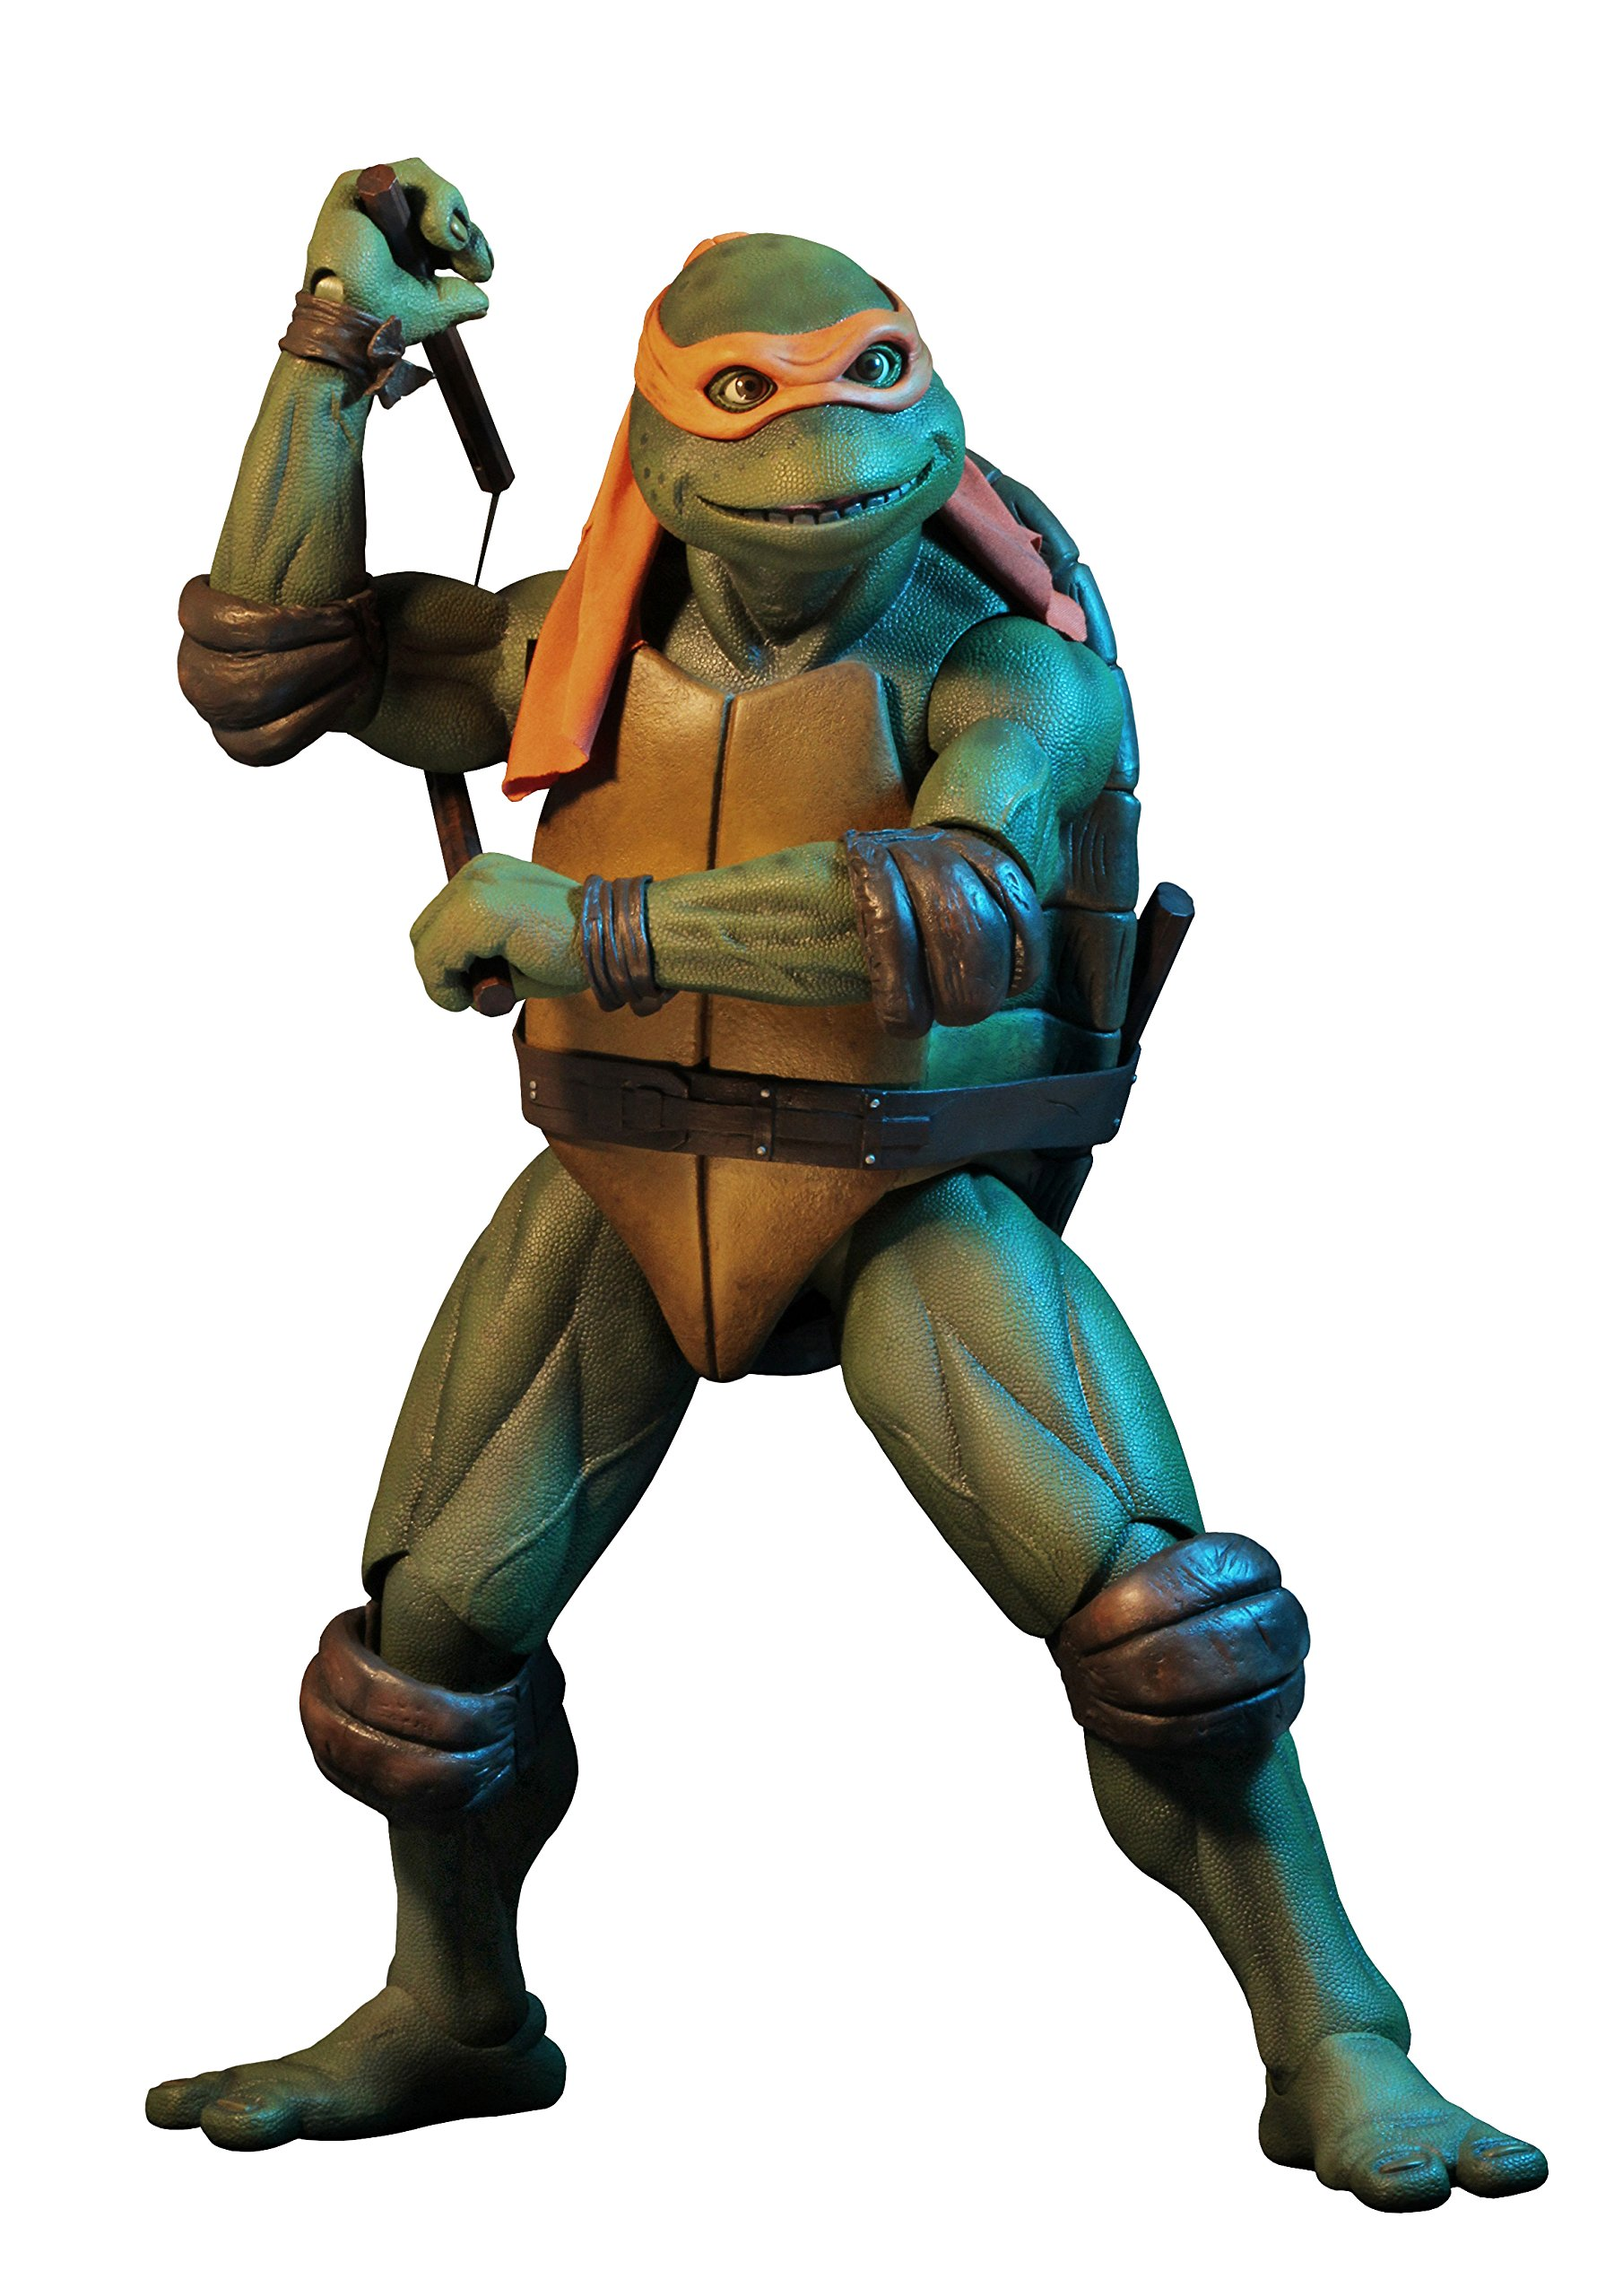 NECA - Teenage Mutant Ninja Turtles (1990 Movie) - 1/4 scale action figure - Michelangelo by NECA (Image #1)